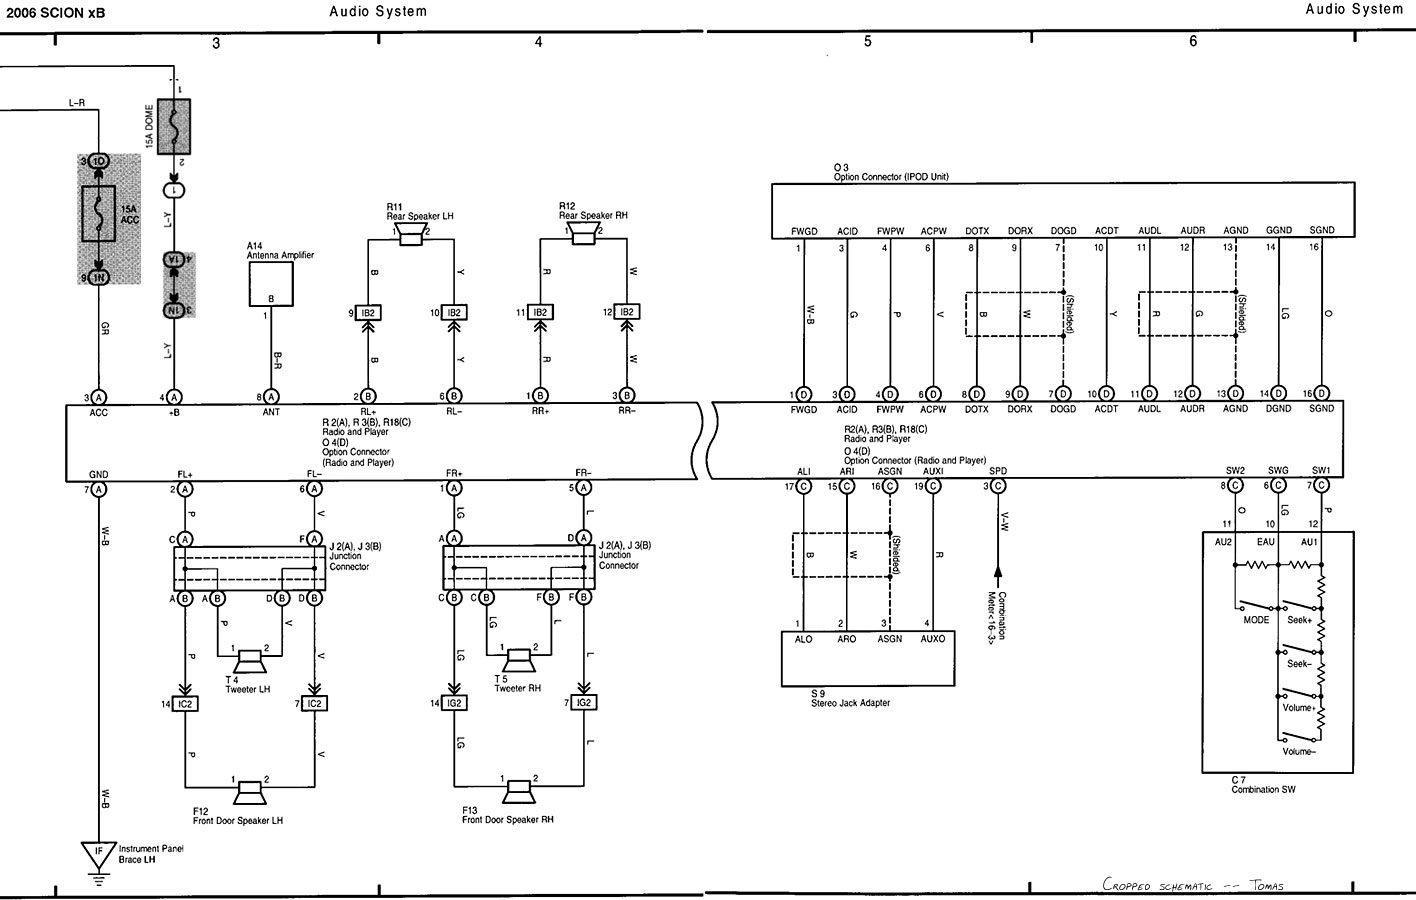 2005 scion tc radio wiring diagram?td1508751668 scion amplifier wiring diagram scion wiring diagrams collection  at couponss.co